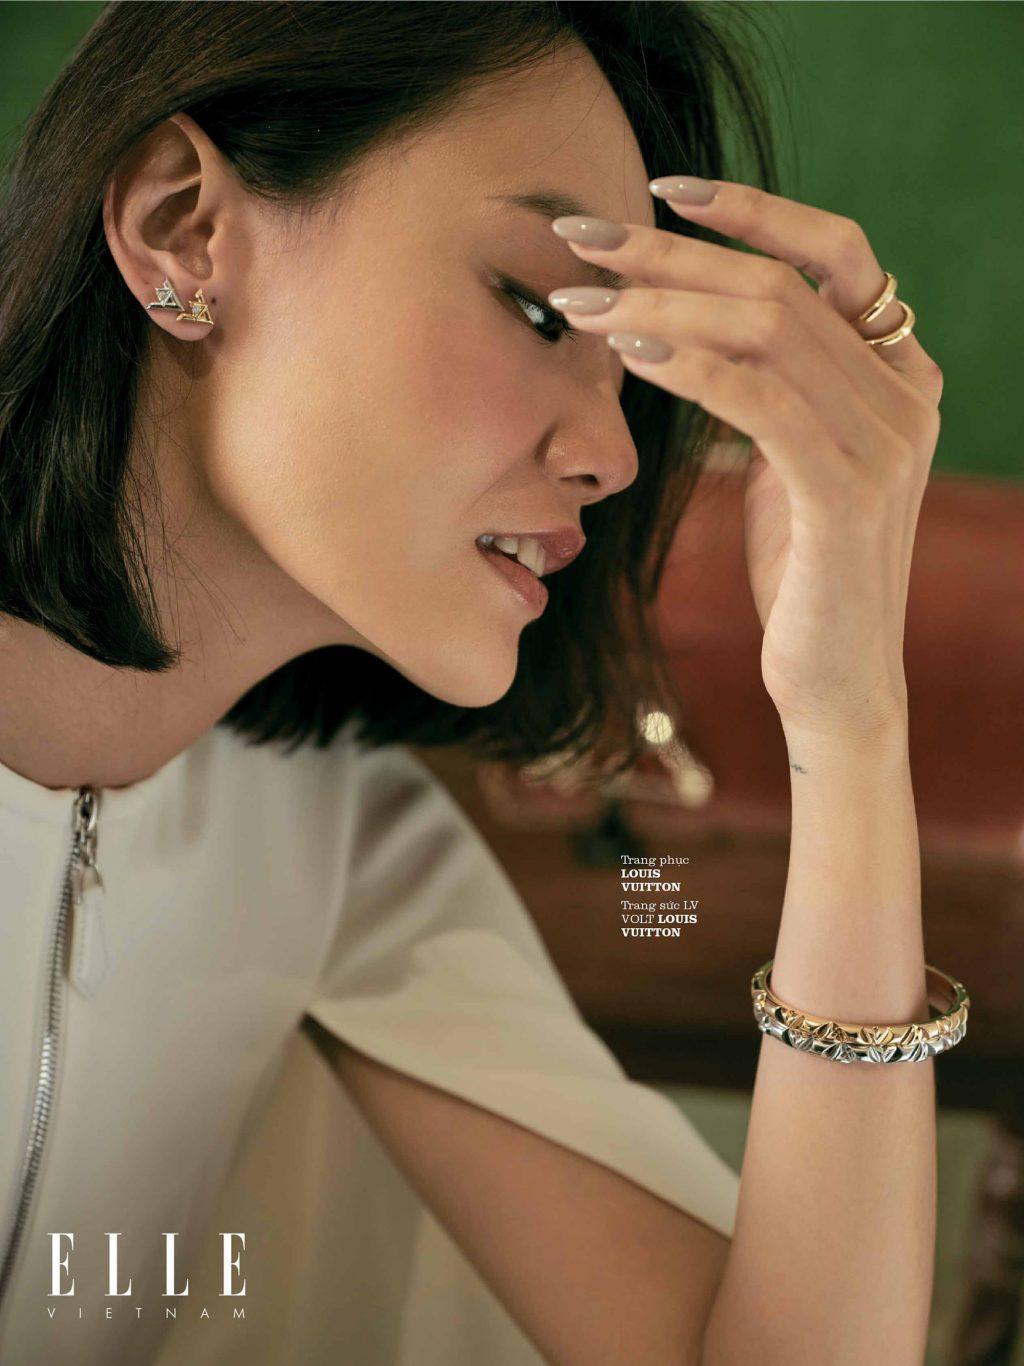 bộ ảnh thời trang trang sức Louis Vuitton